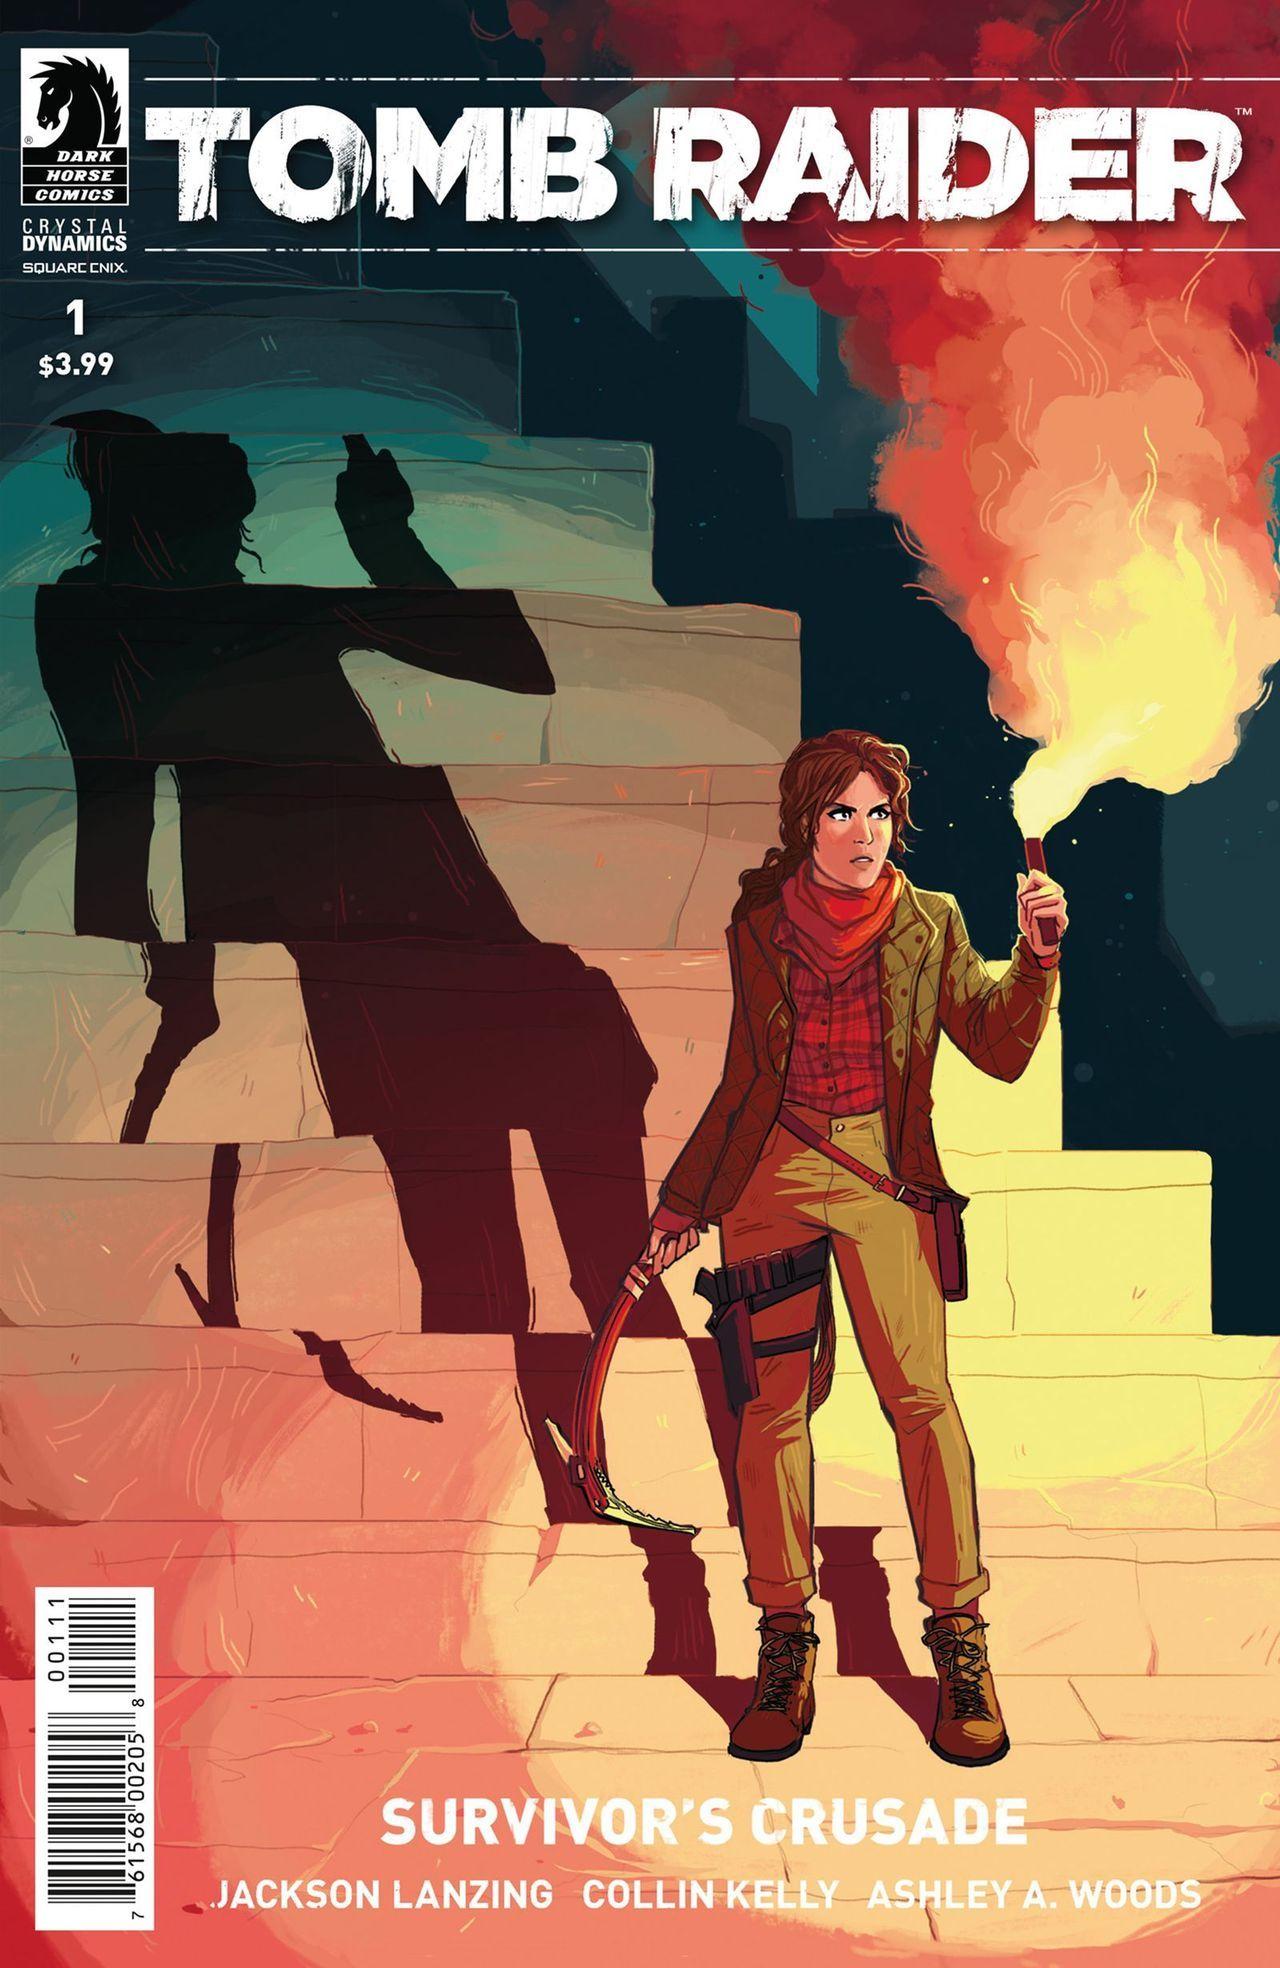 Tomb Raider Survivor's Crusade